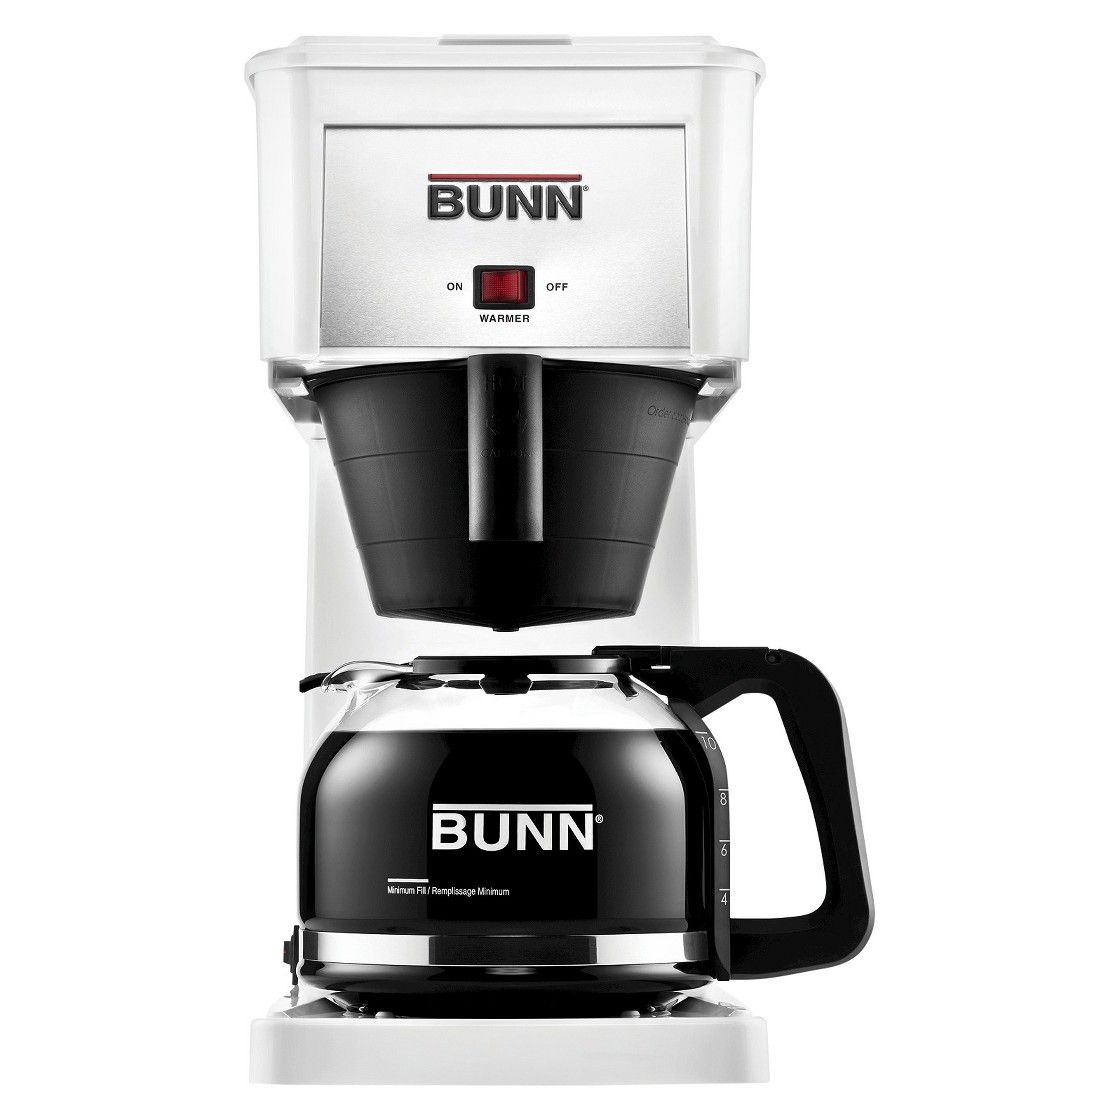 tripletap to zoom in Bunn coffee maker, Bunn coffee